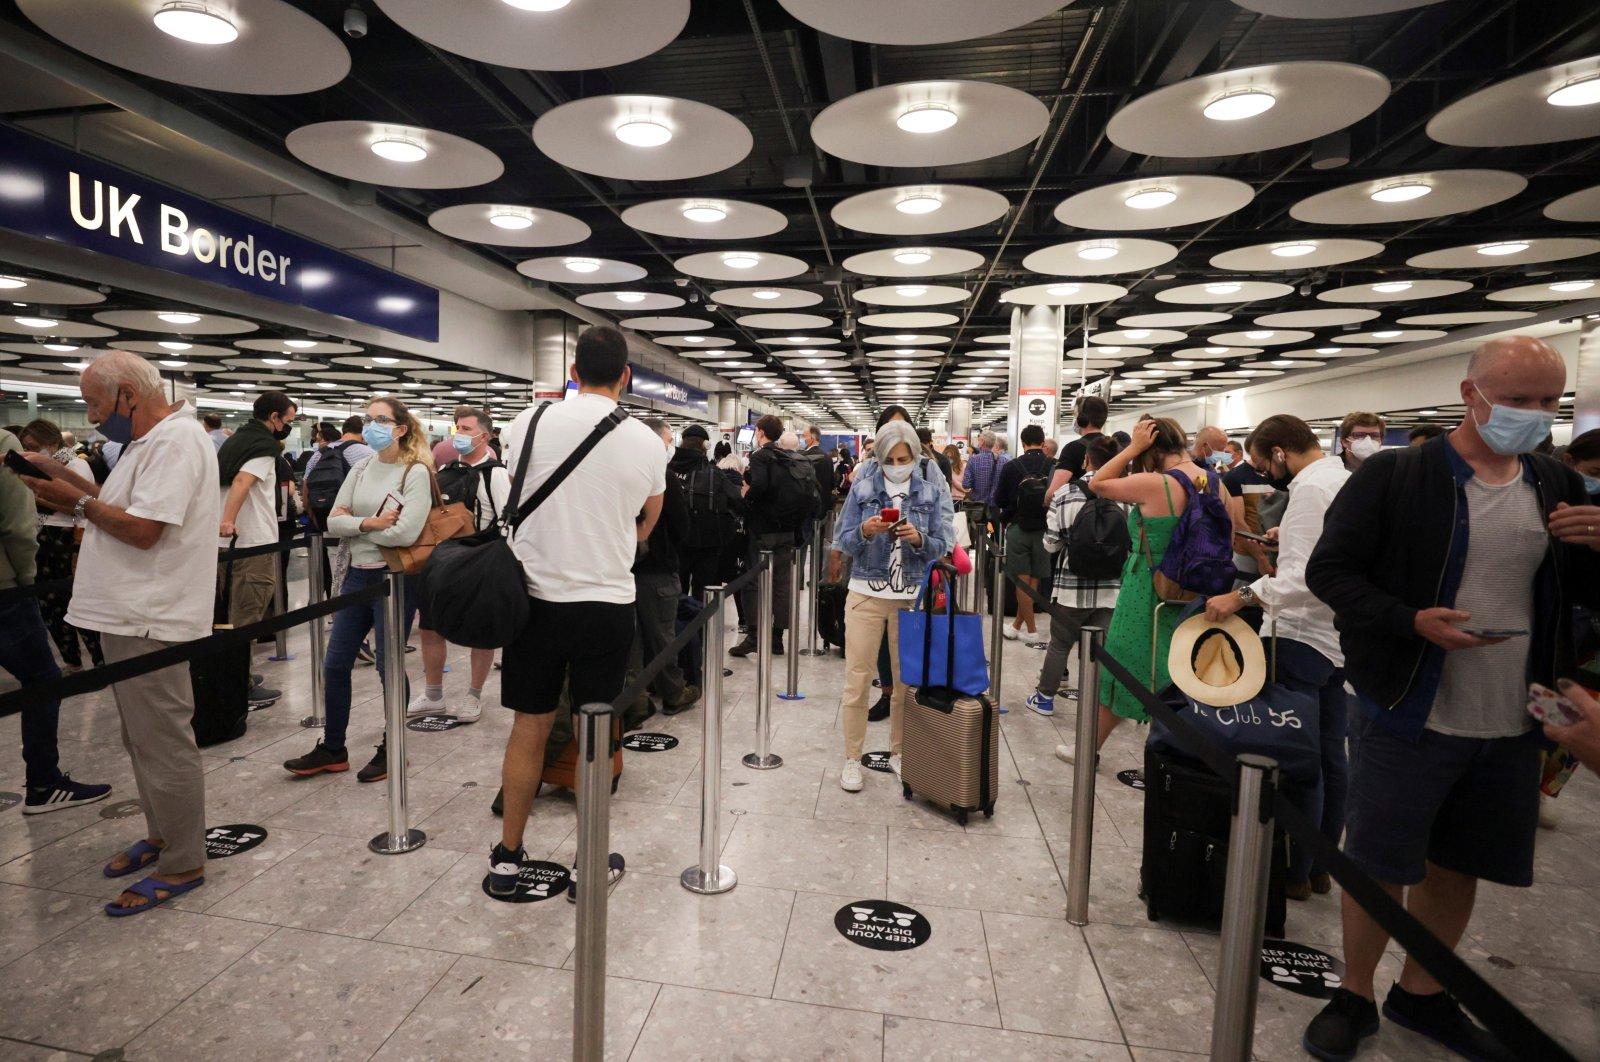 Arriving passengers queue at U.K. Border Control at Terminal 5 at Heathrow Airport in London, Britain June 29, 2021. (Reuters Photo)